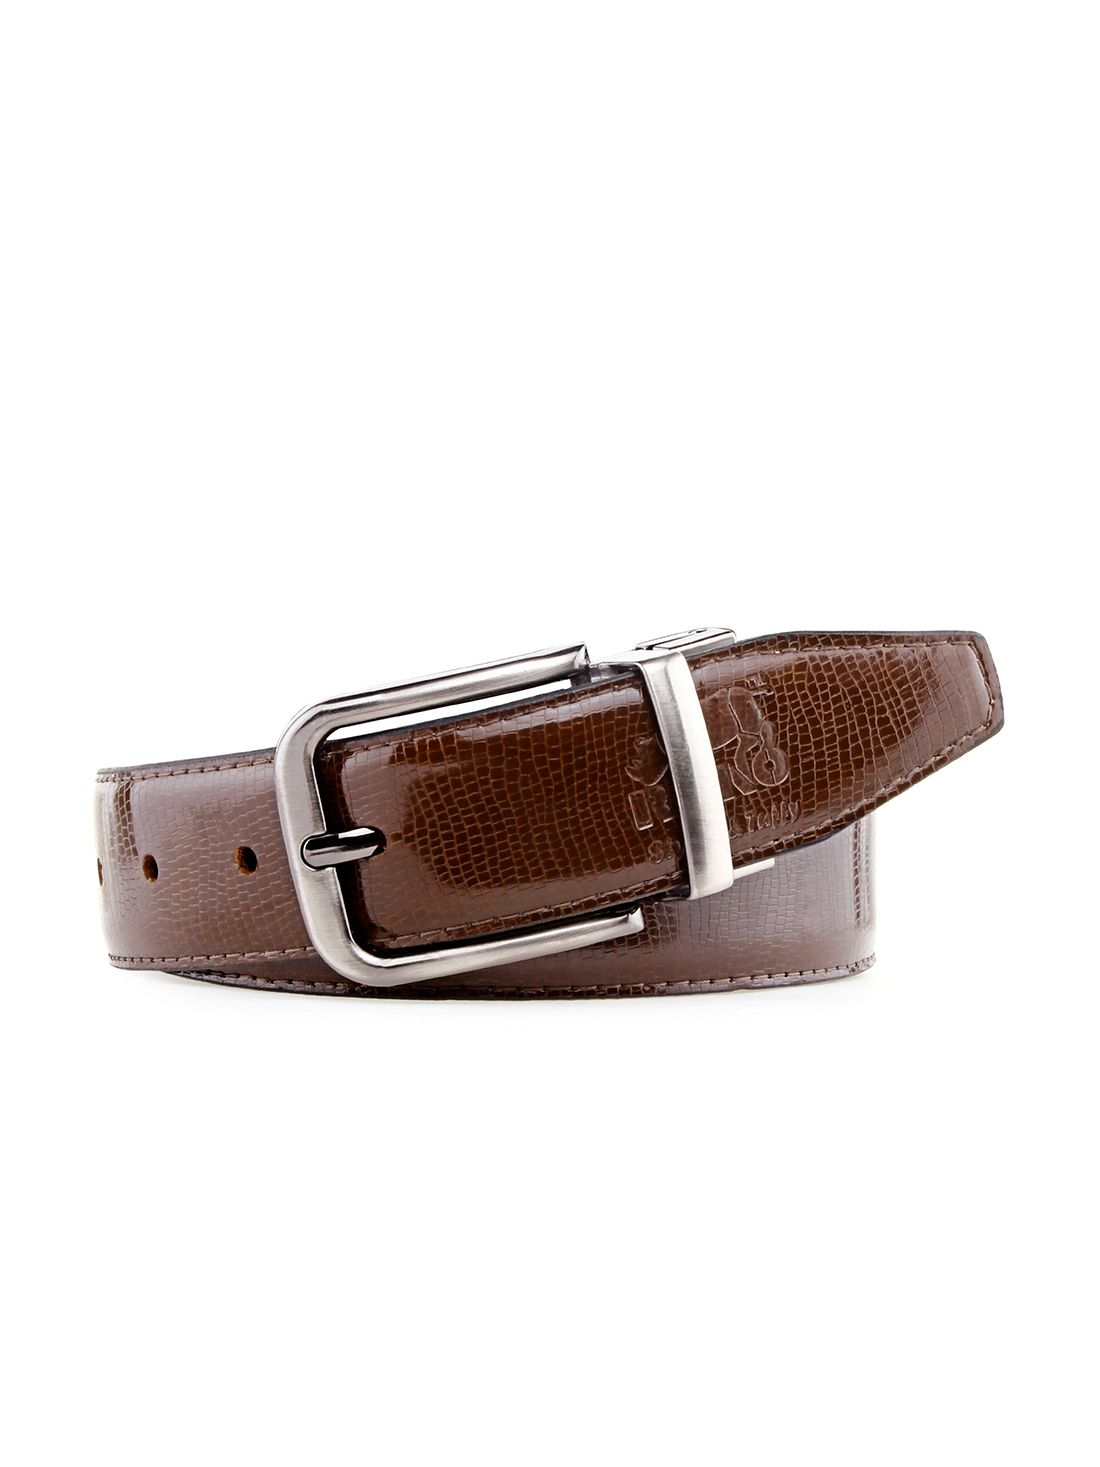 Rhino Brown Formal Belt For Men